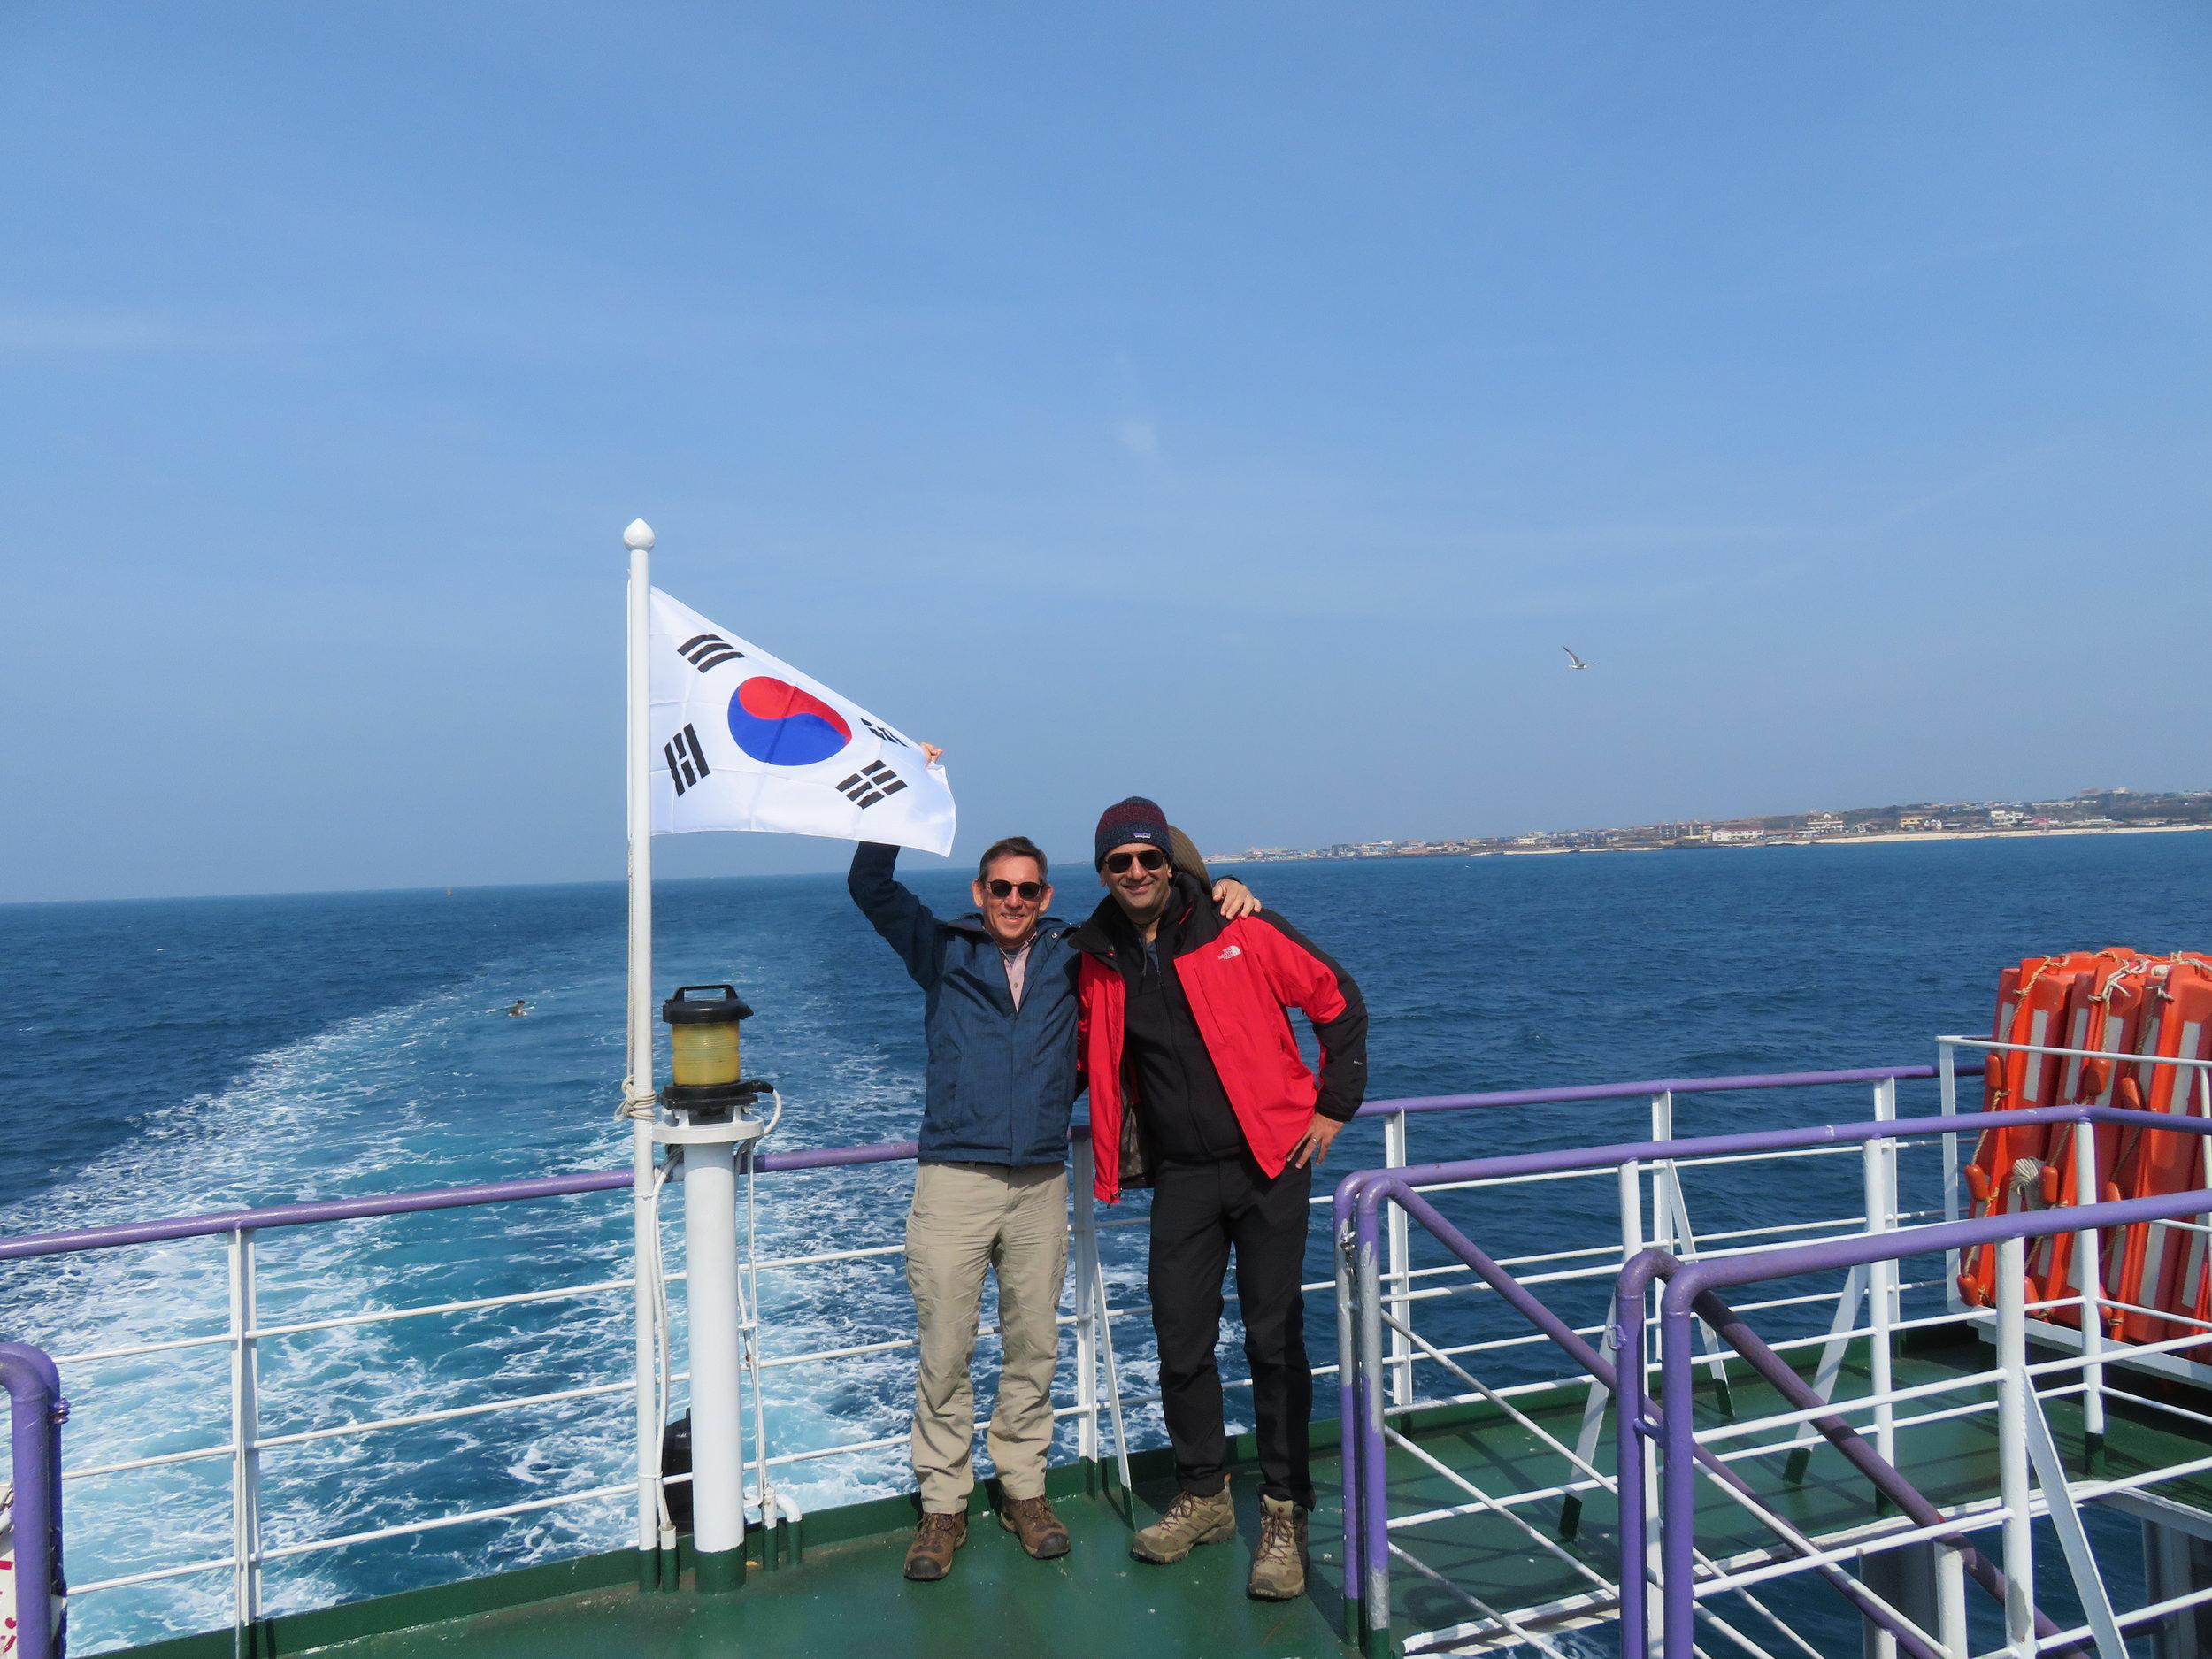 On the ferry between Seongsan and U-do Island